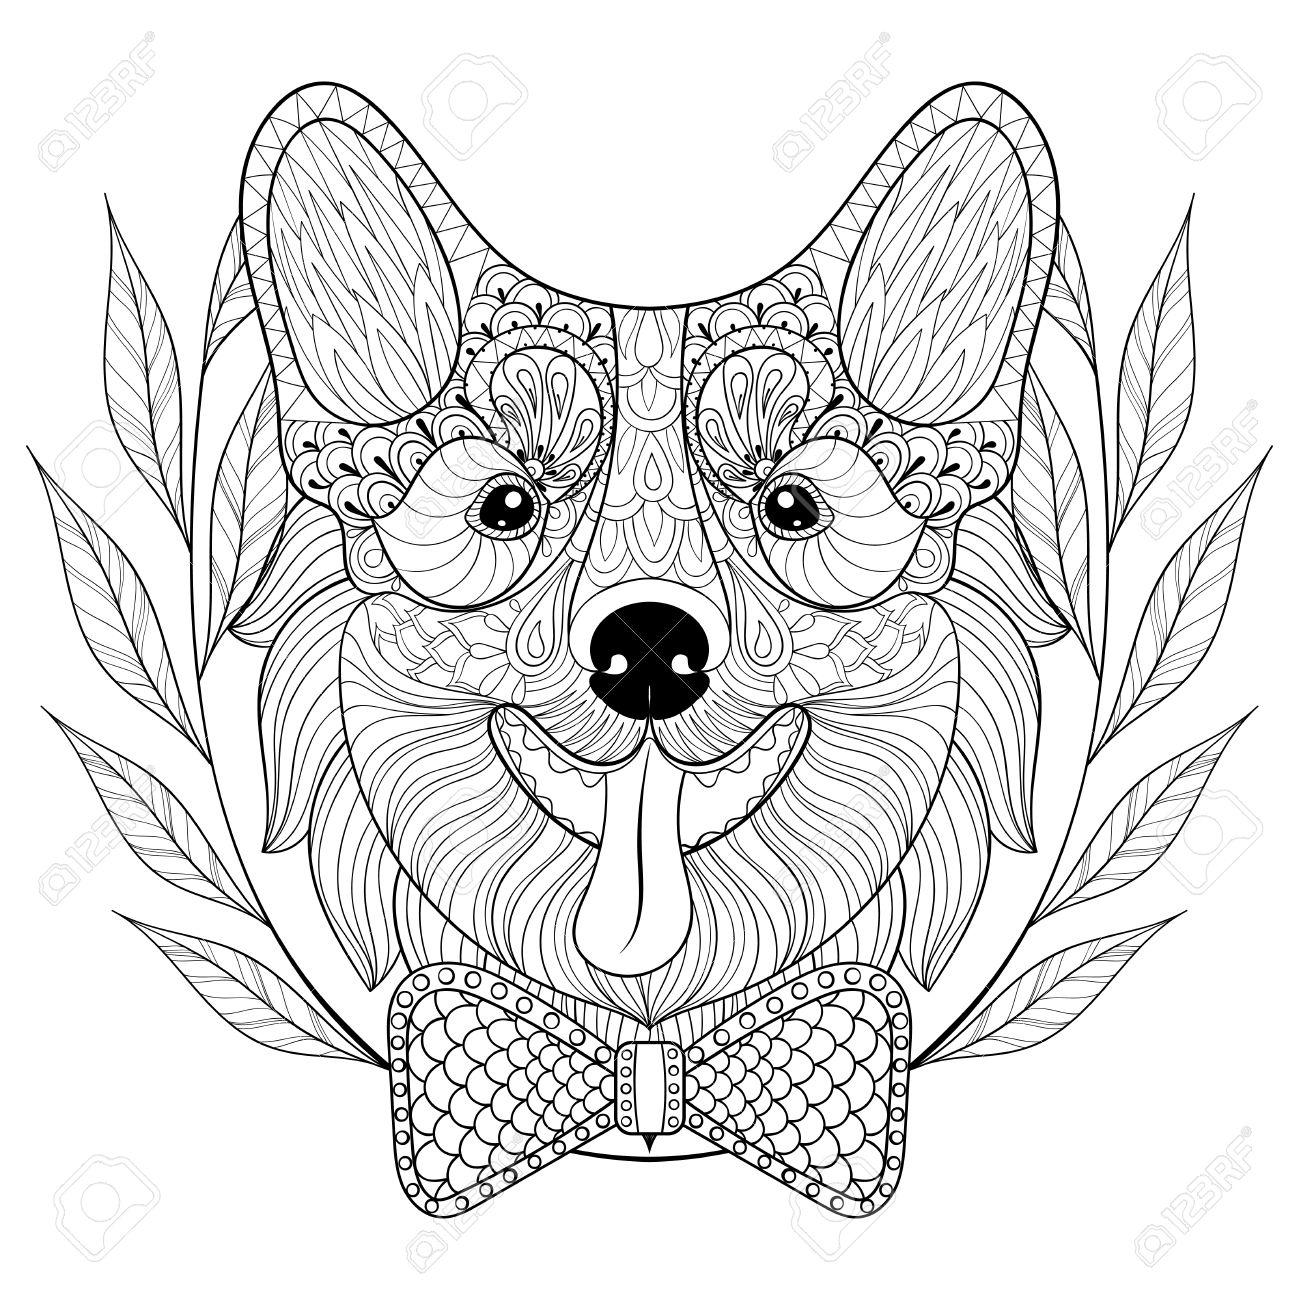 - Welsh Corgi With Bow Tie, Wreath Frame. Happy Puppy, Pembroke